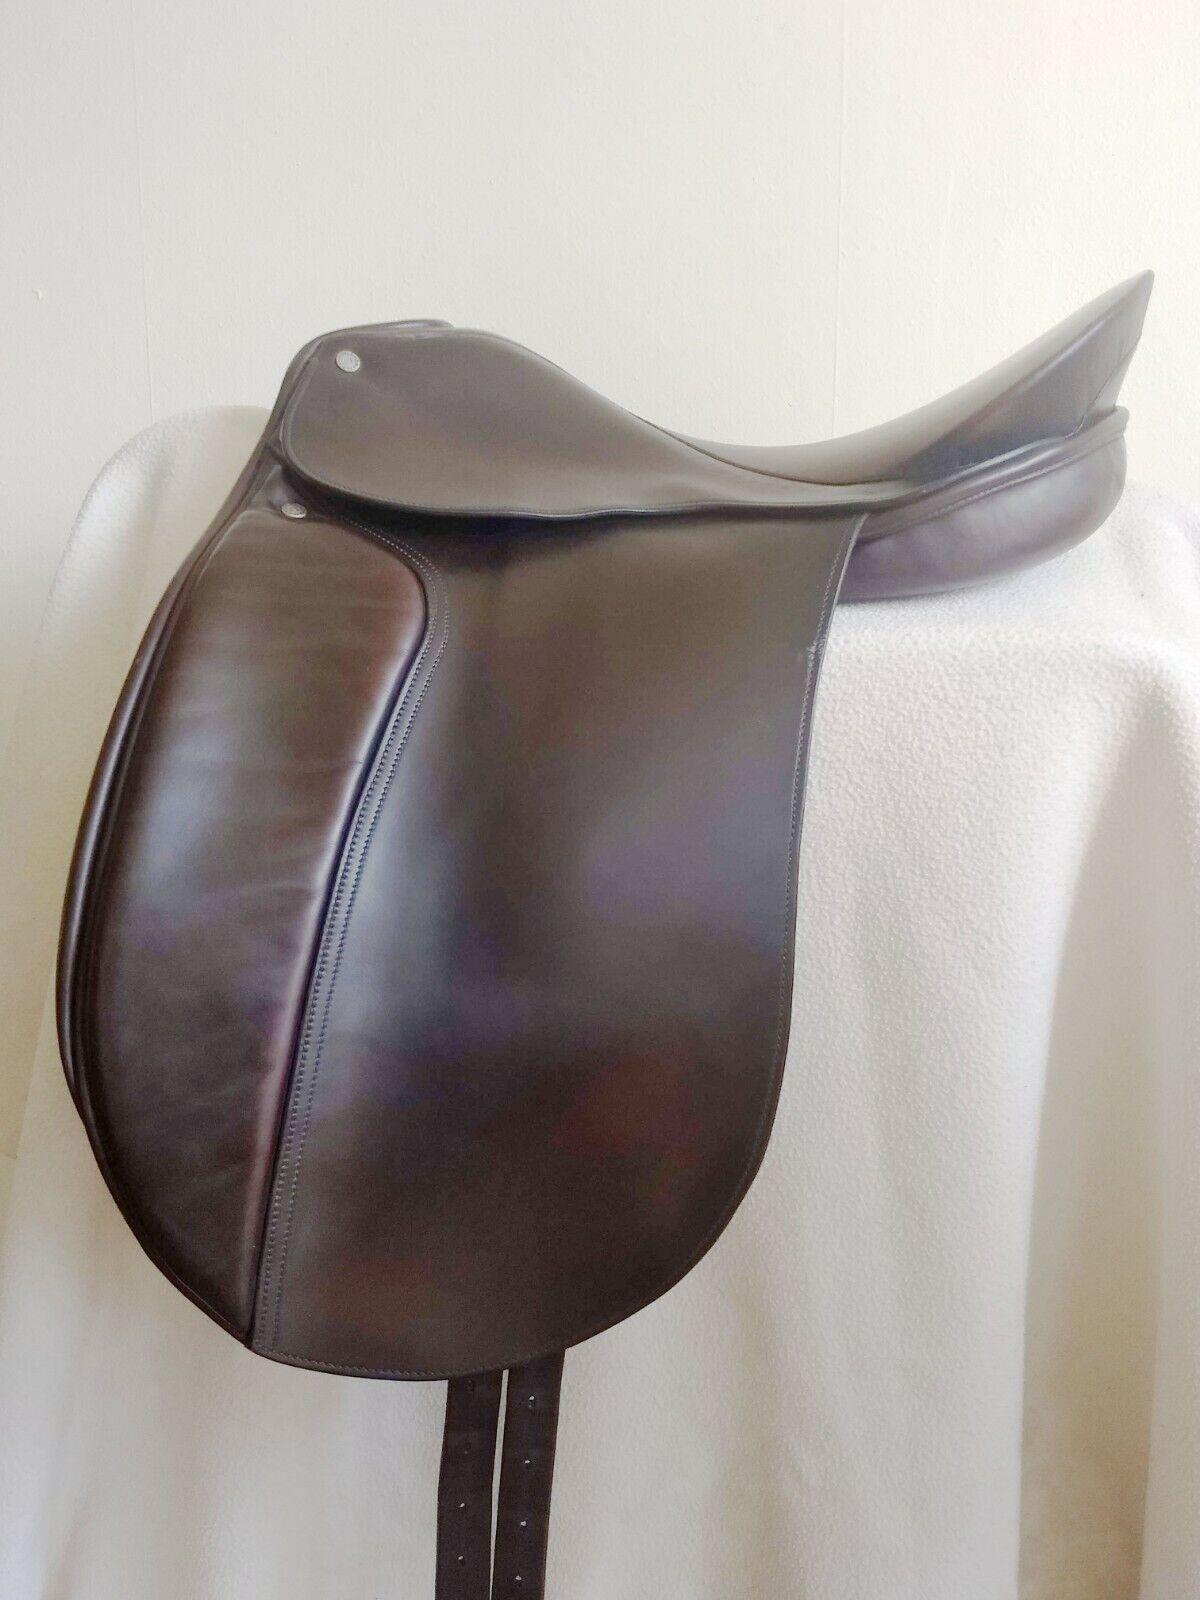 Thgoldughbred Saddlery - Classic English  Dressage Saddle 17 - Narrow tree  inexpensive